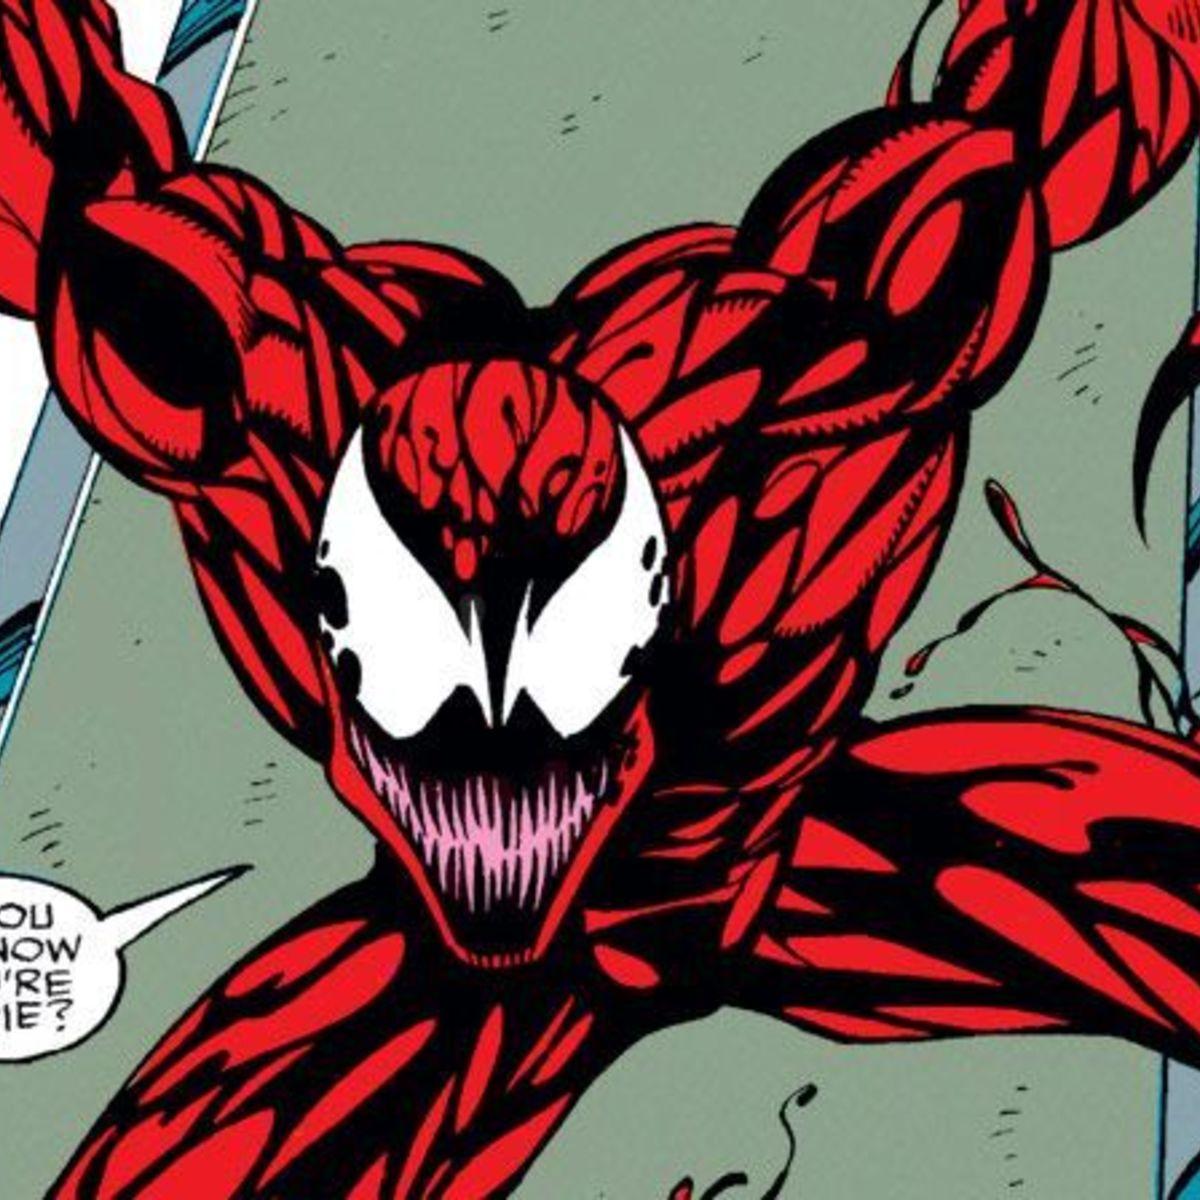 marvel creators reveal carnage s sociopathic origin plus what s